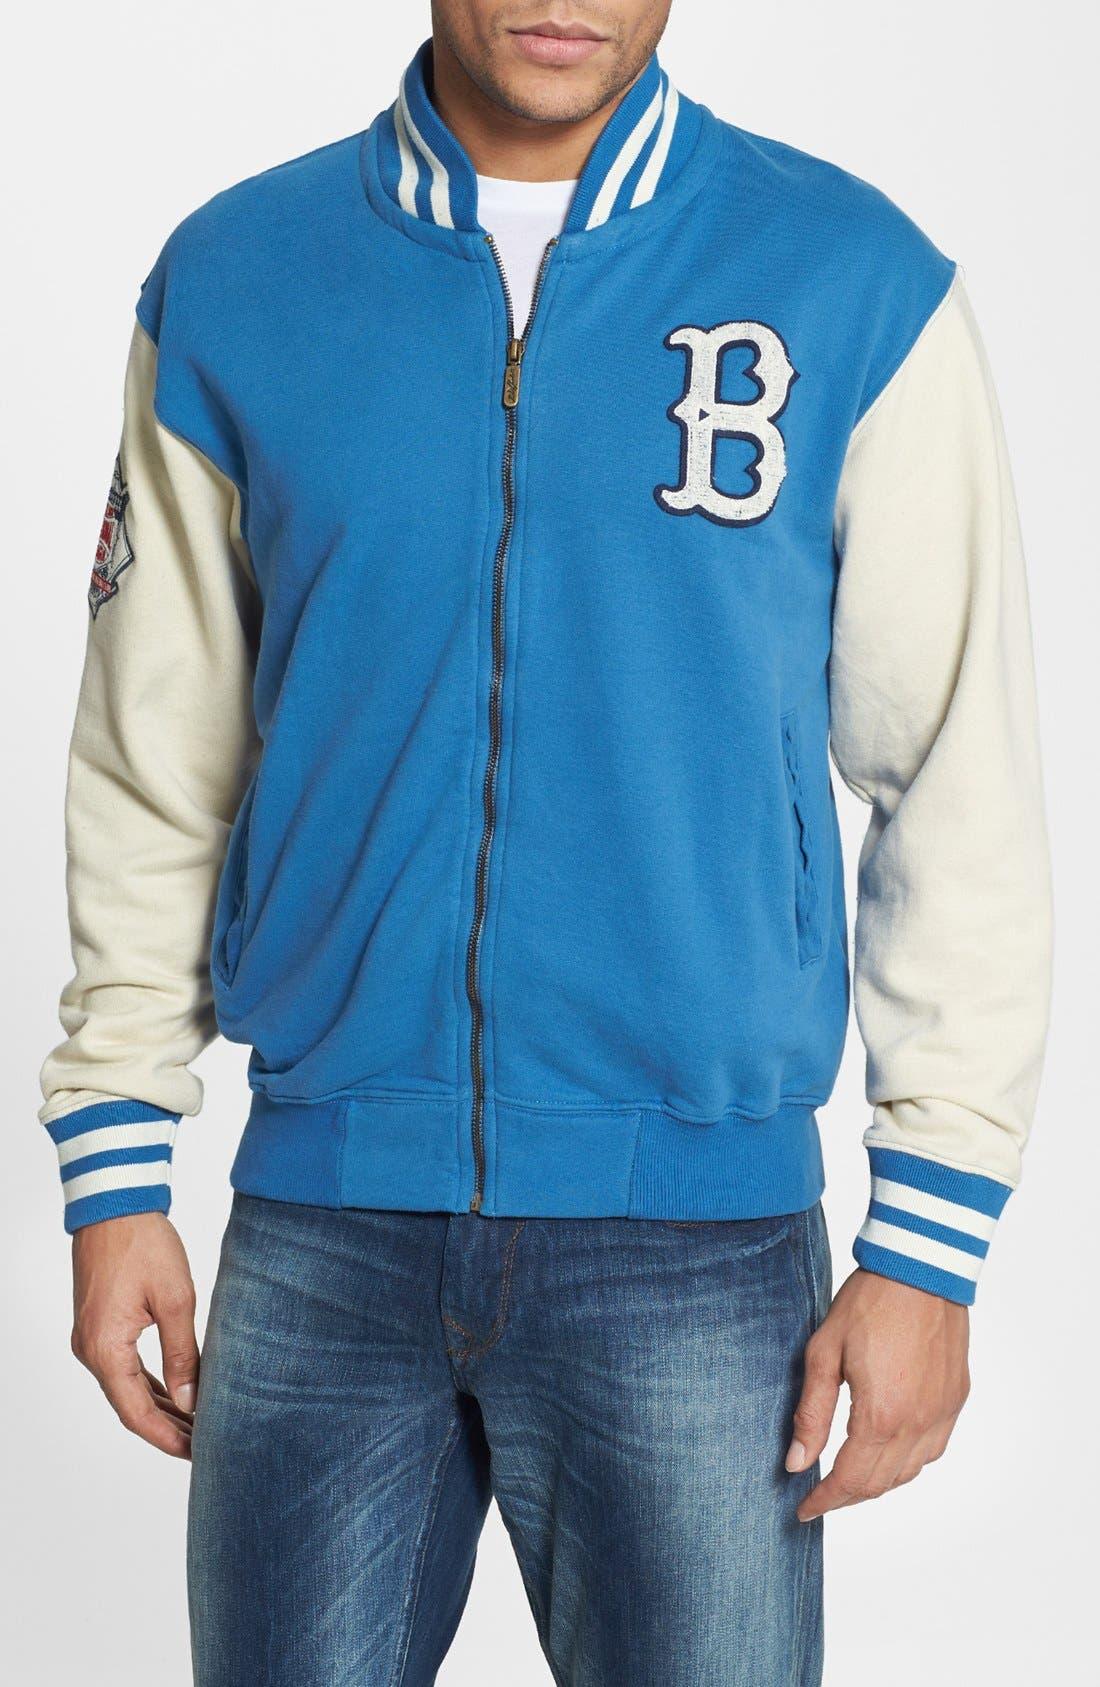 Main Image - American Needle 'Brooklyn Dodgers' Varsity Jacket